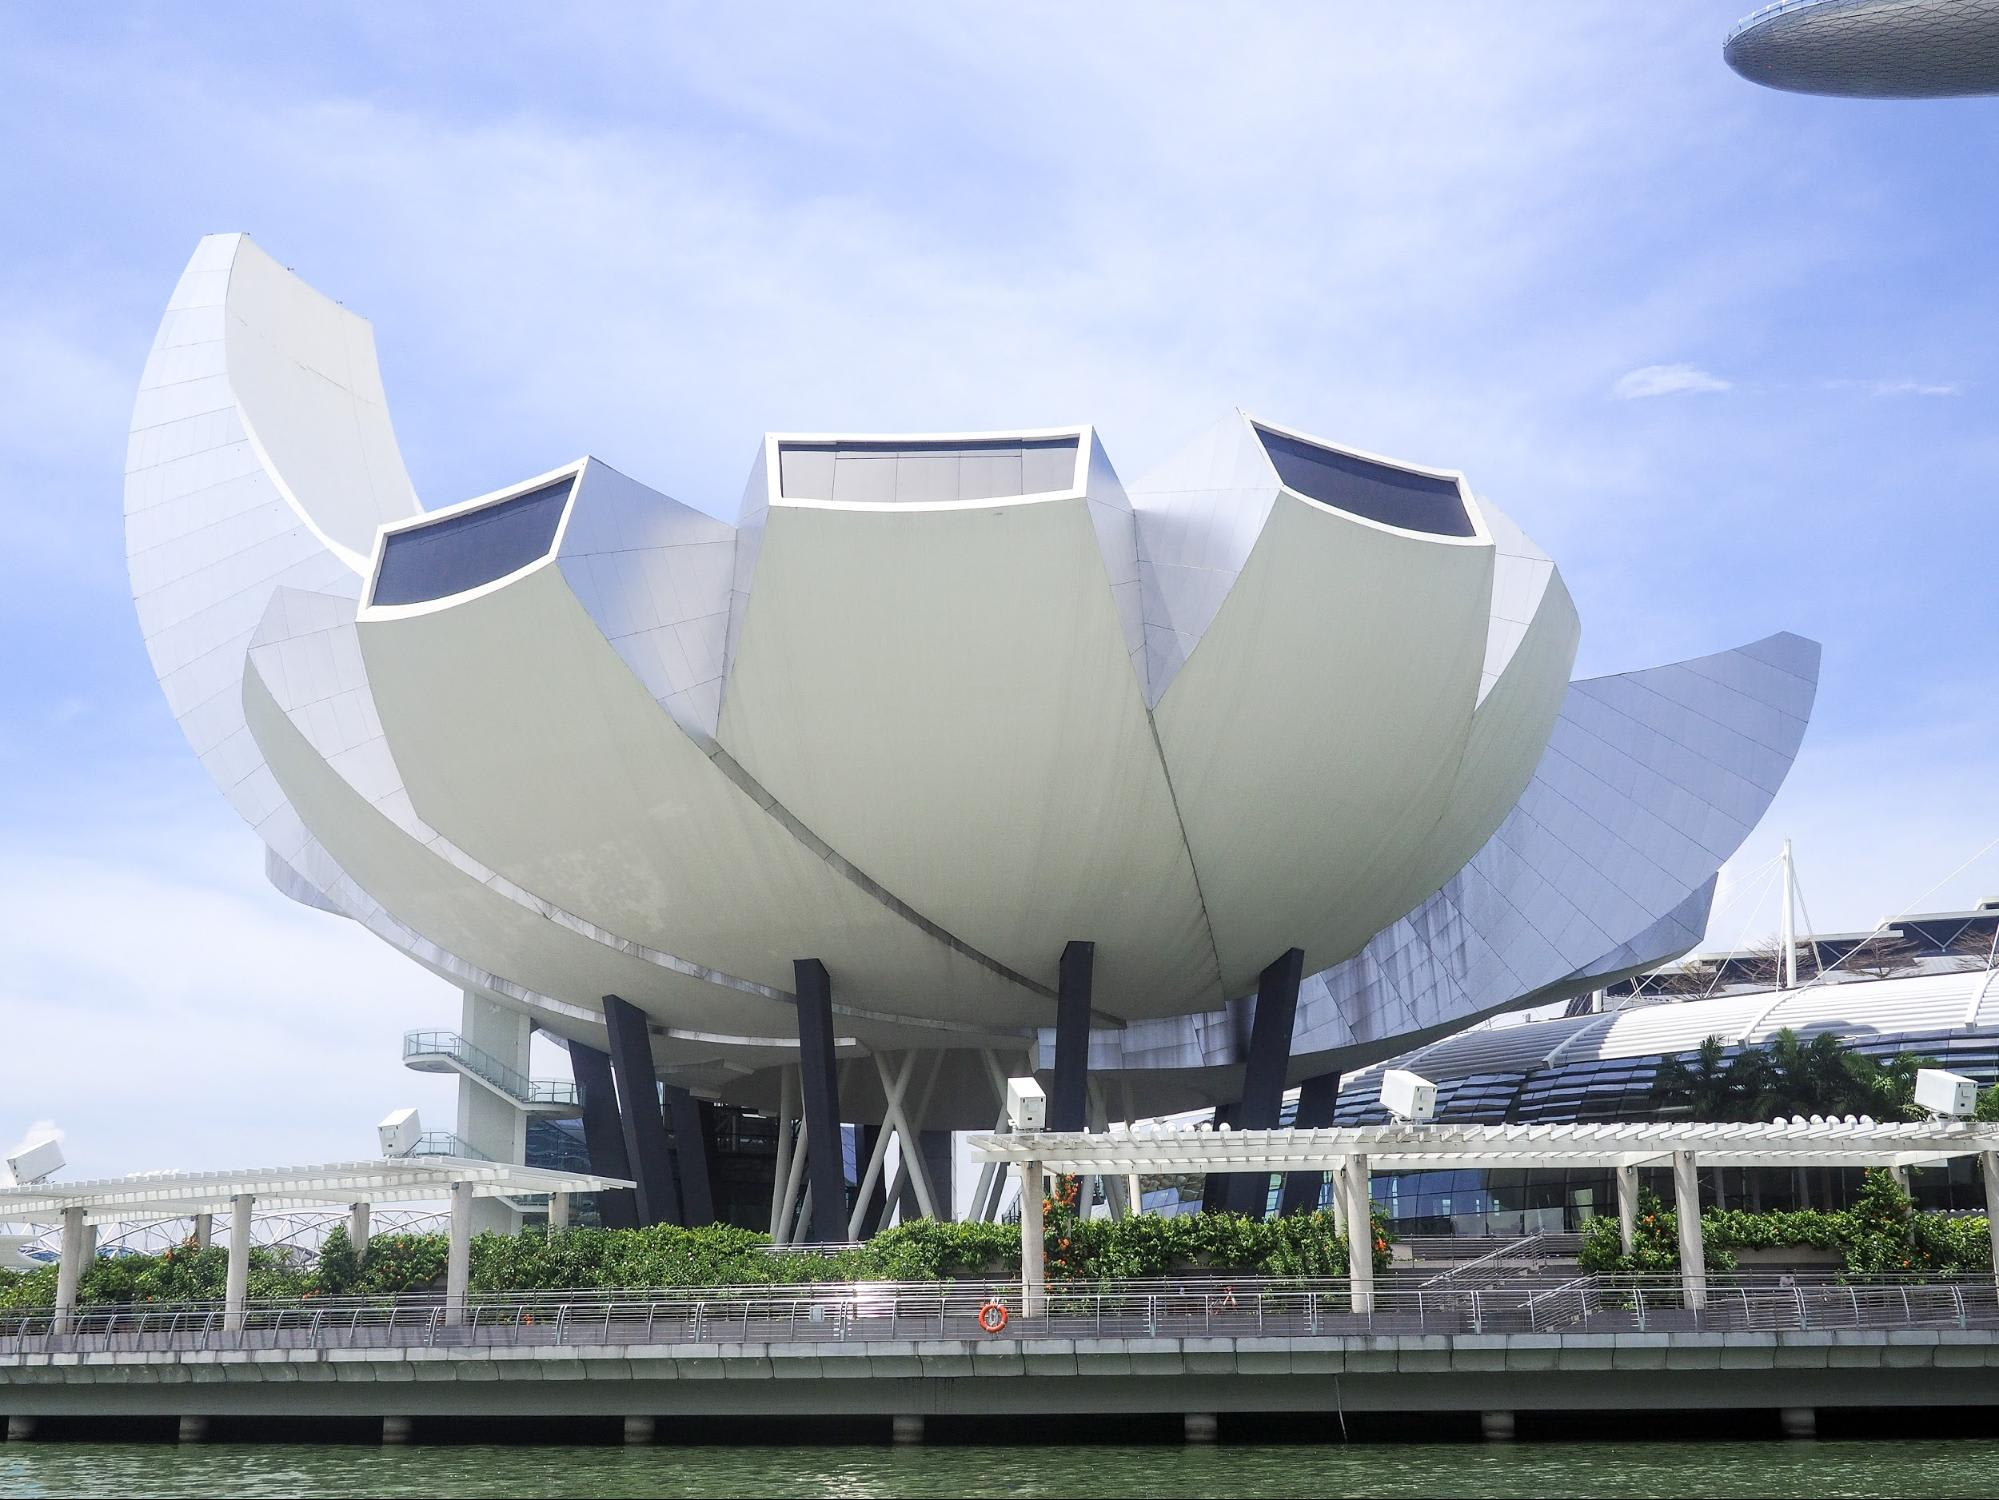 marina bay sands singapore 11 noi nhat dinh phai den11